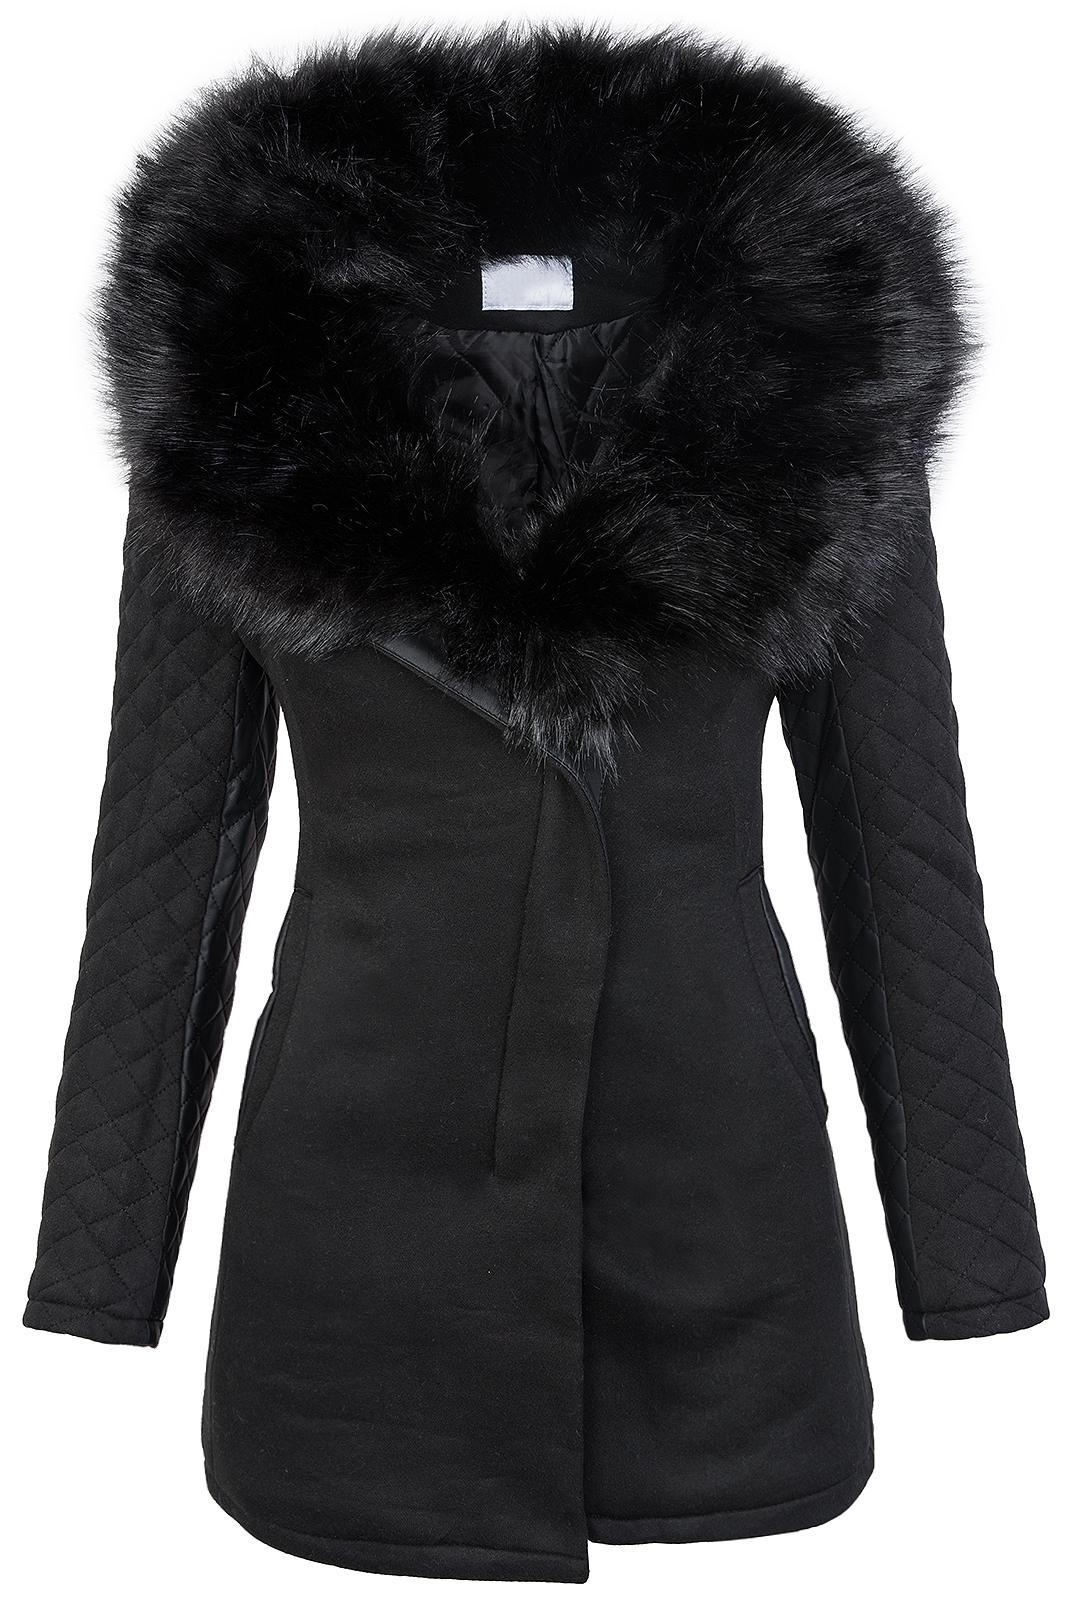 reputable site 3426f b965a Details zu Damen designer winter jacke schwarzer fellkragen jacke mantel  wintermantel D-234